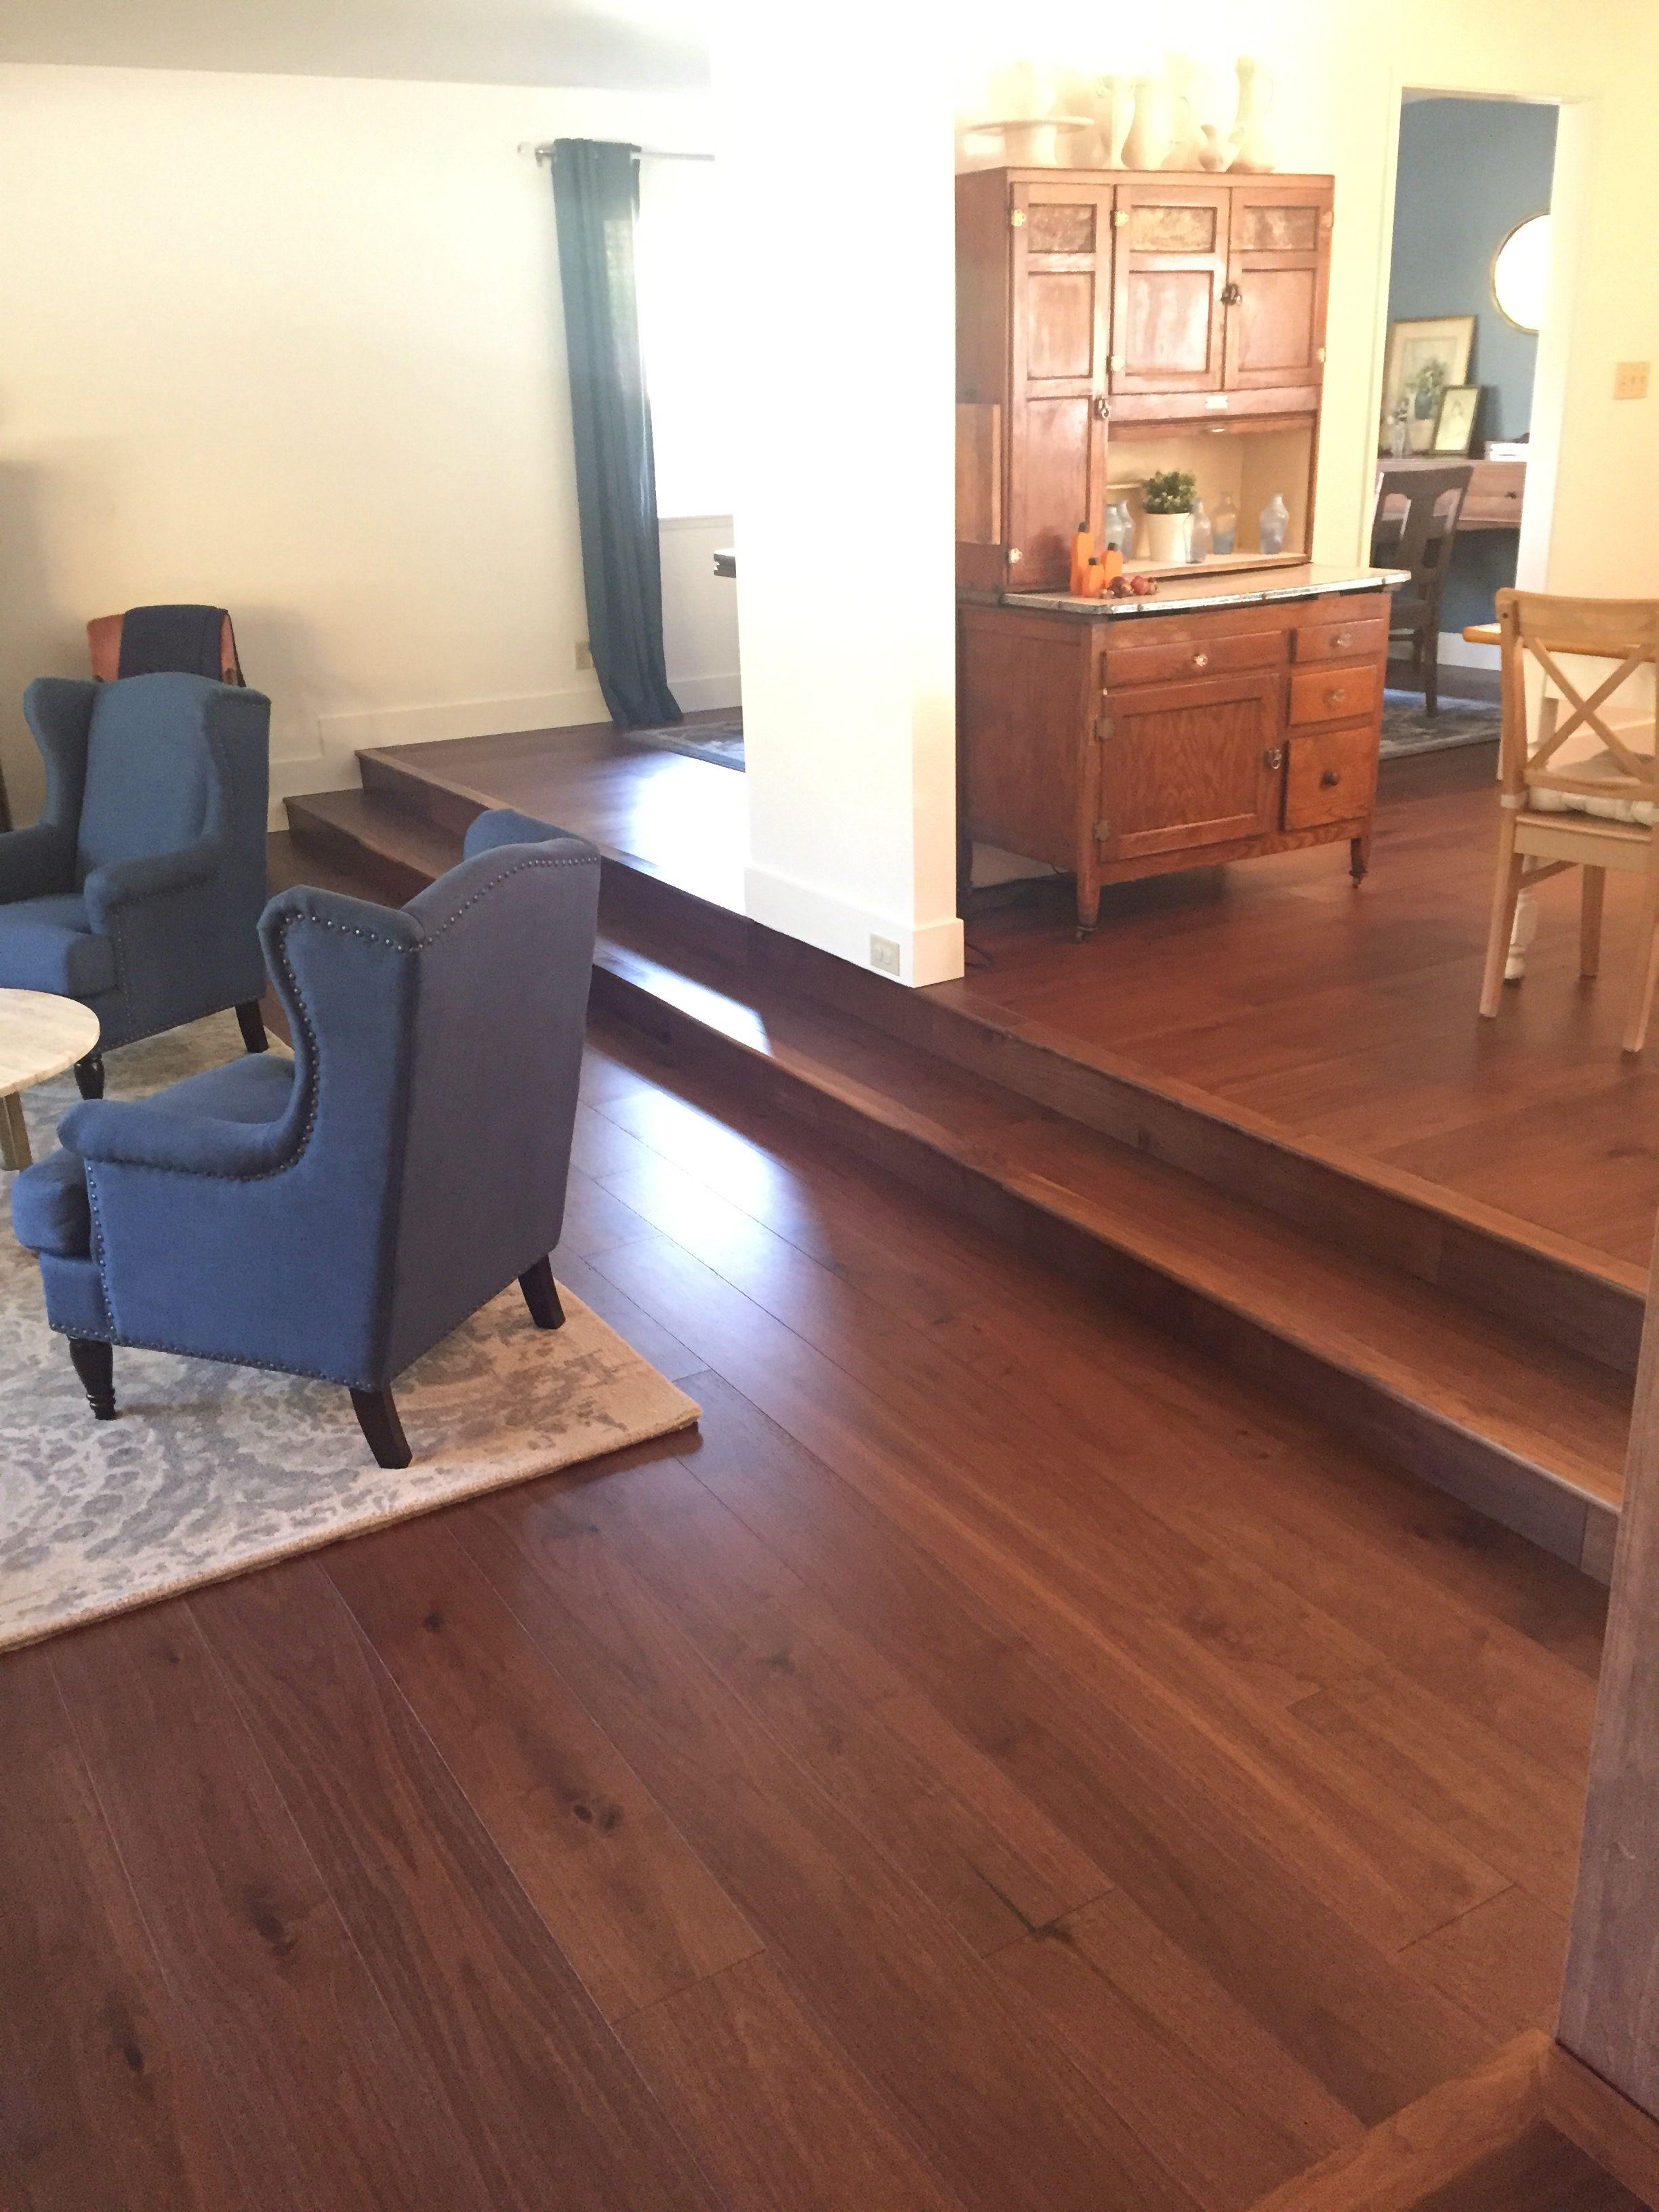 Reward Wood Flooring Castle Collection Walnut Upton Wood Floors Flooring Walnut Floors Living room wooden floor